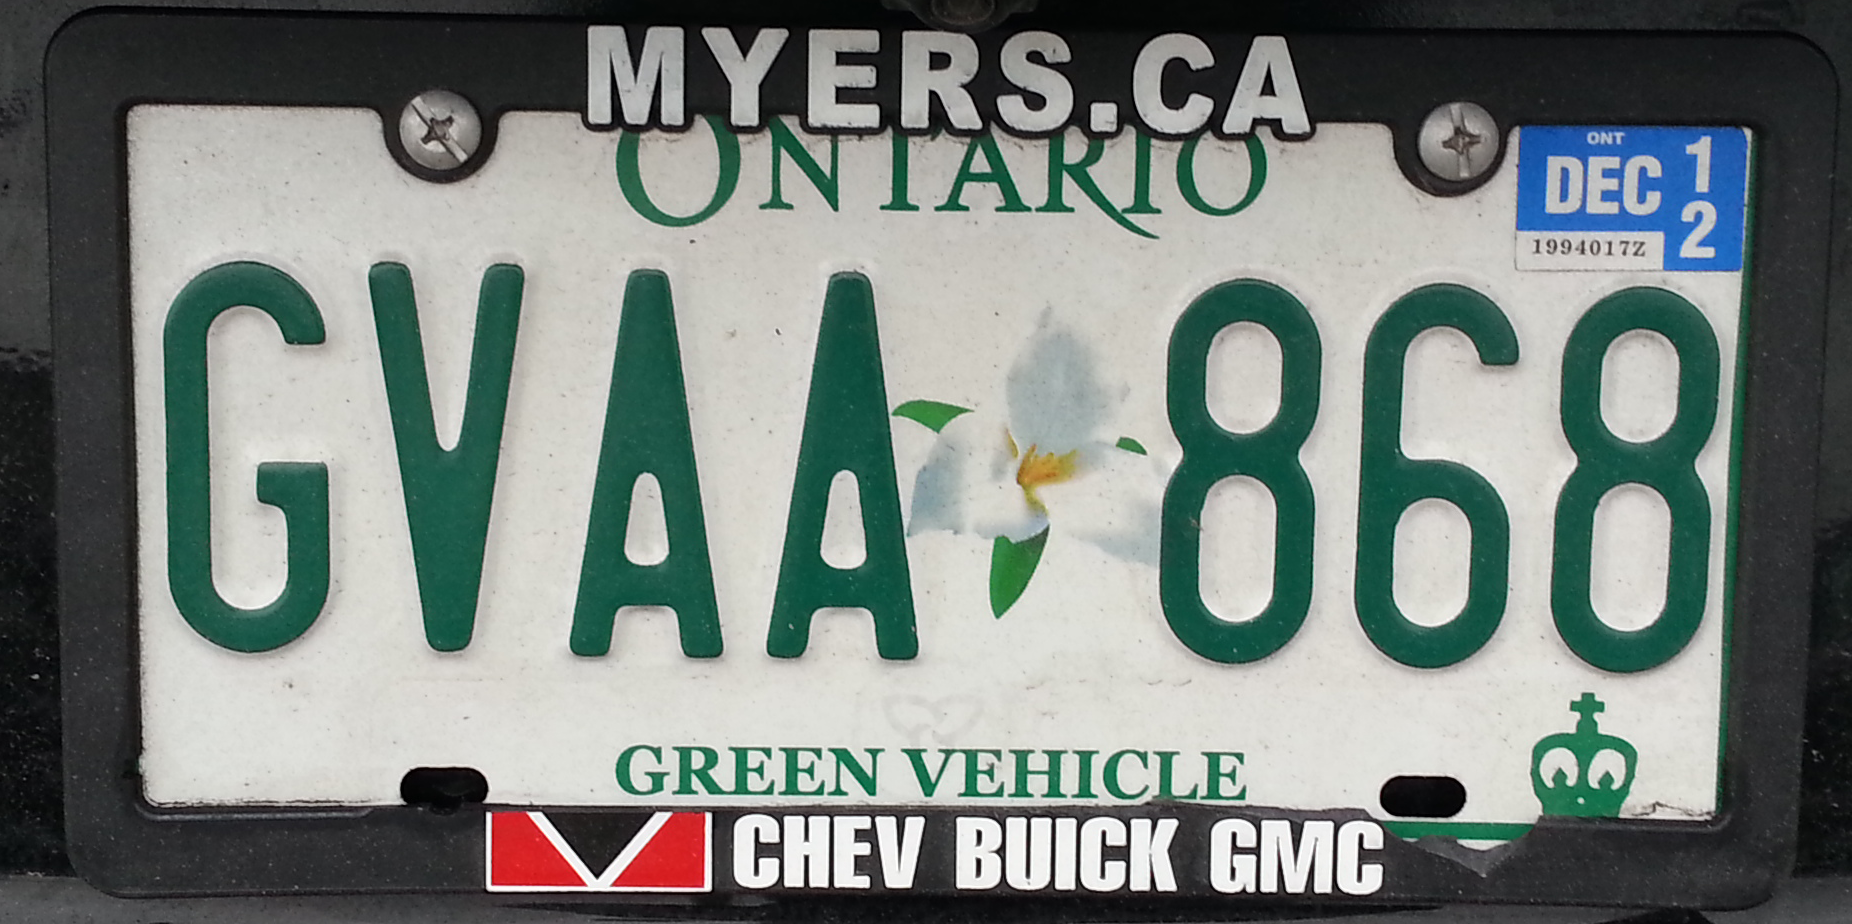 файл 2010 Ontario License Plate Gvaa 868 Electric Vehicle